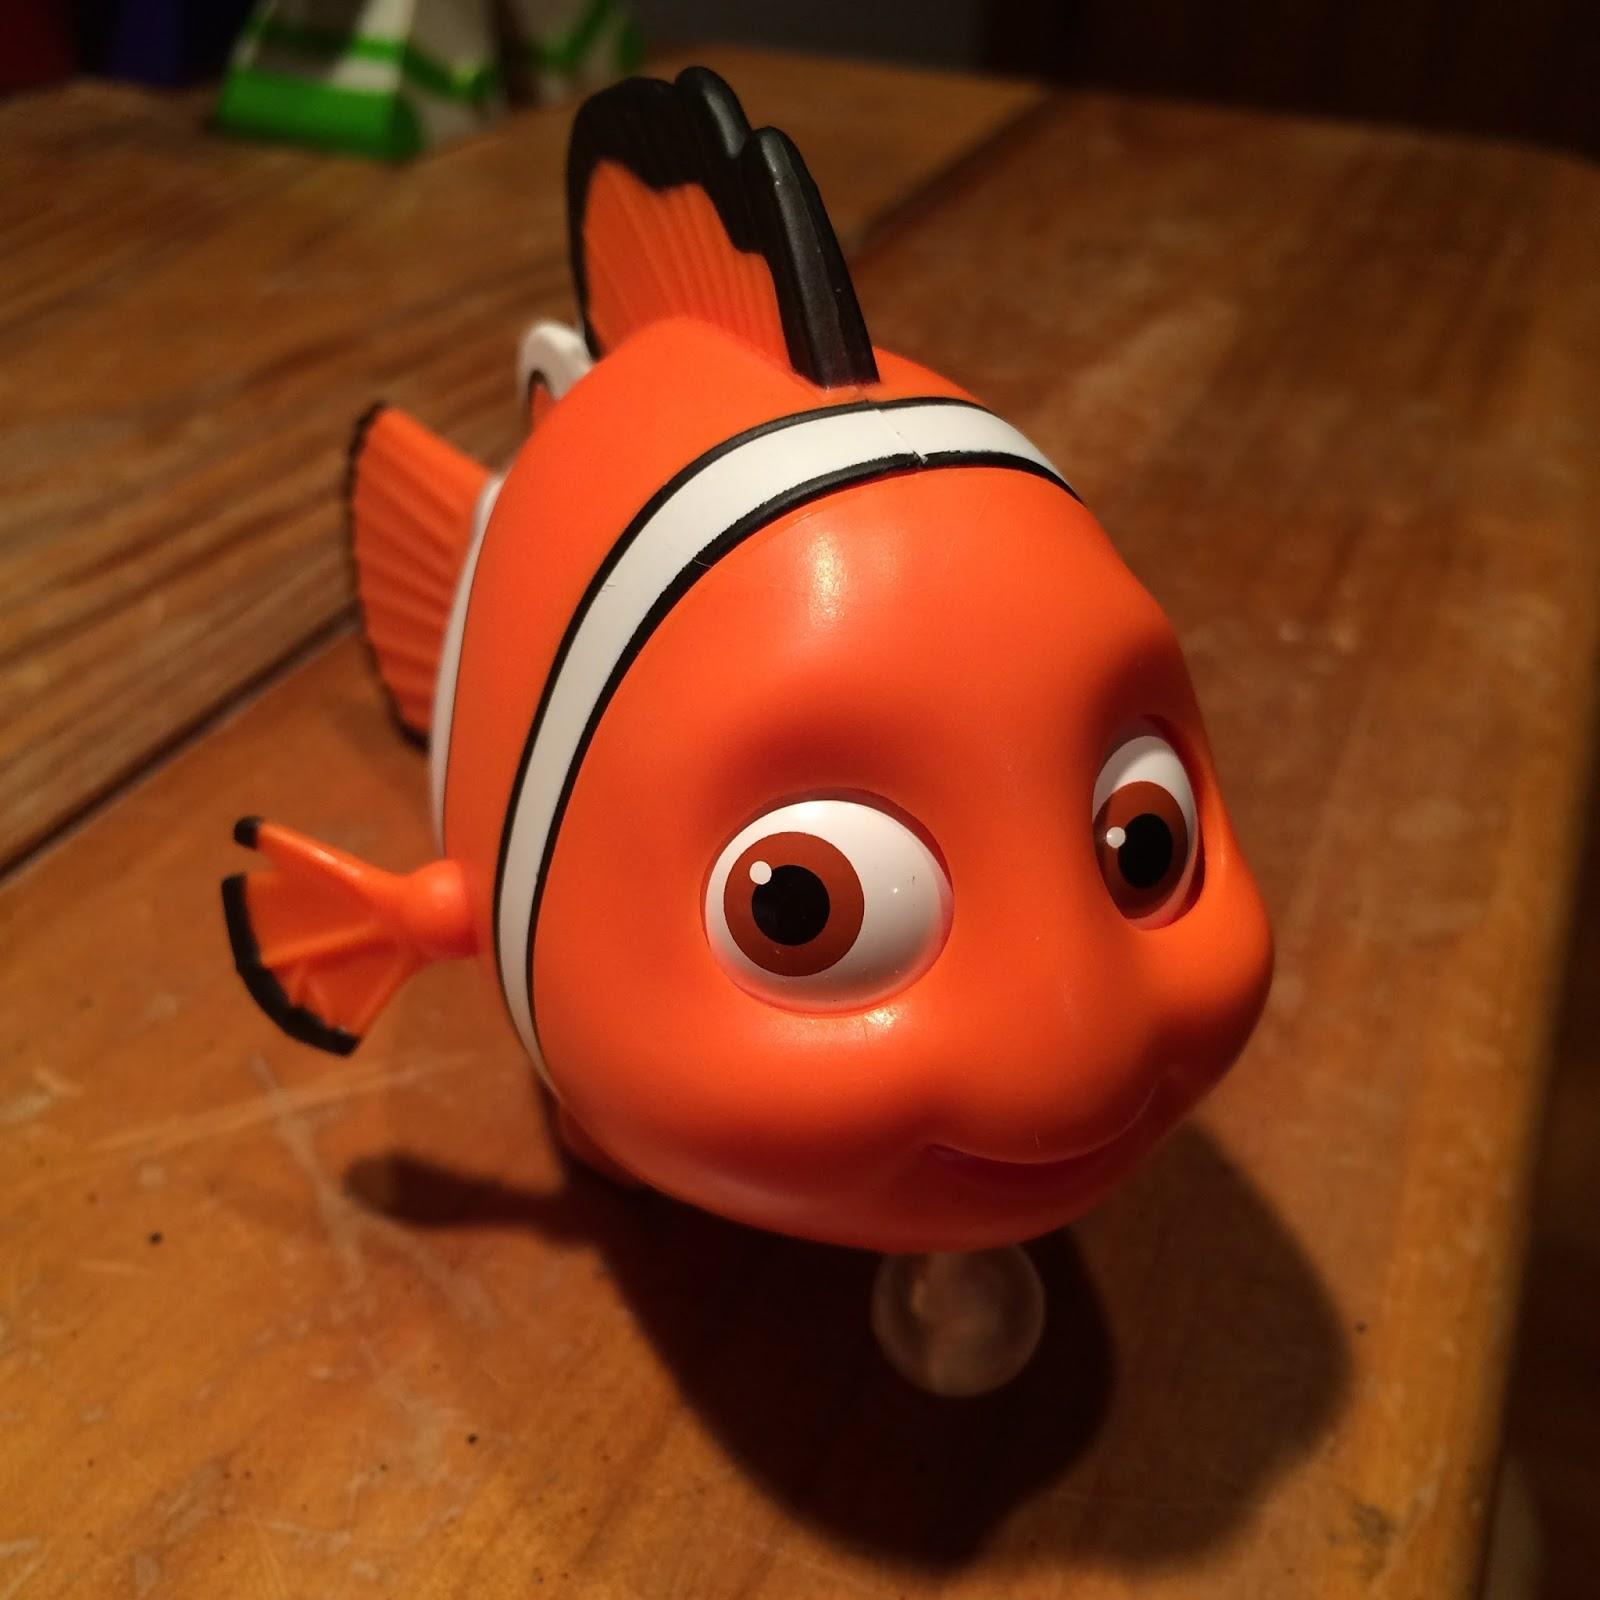 Finding Nemo Toys : Dan the pixar fan finding nemo thinkway toys figure